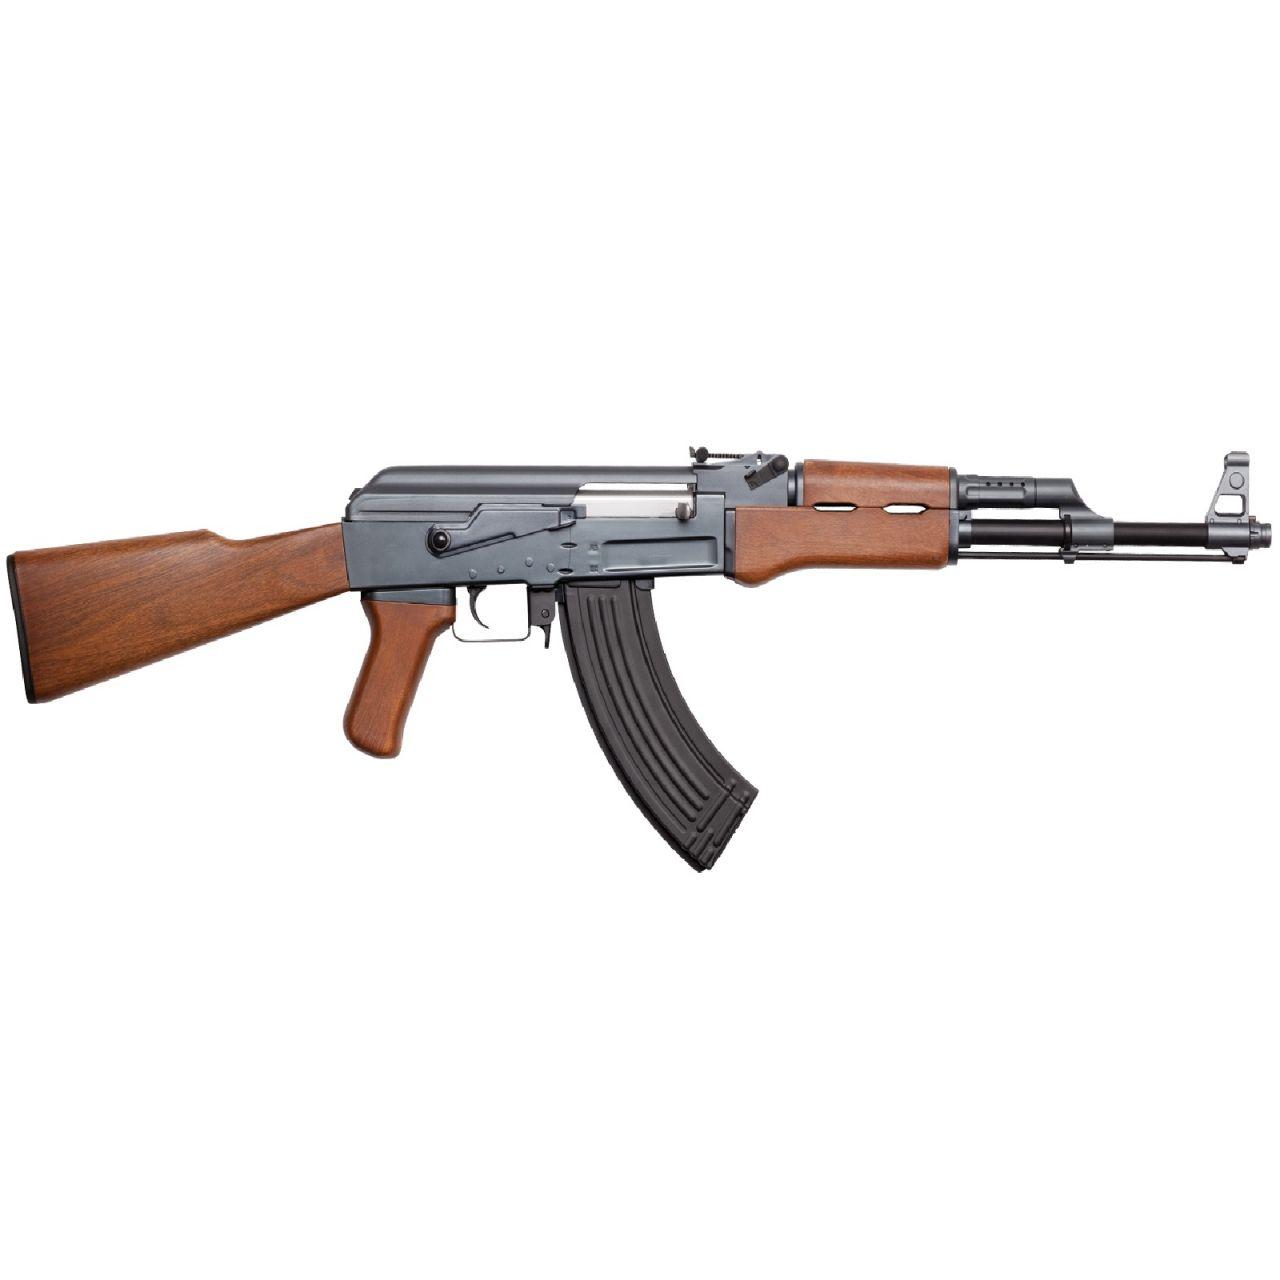 ASG ARSENAL SA M7 (Kalaşnikov AK47 tipi) Airsoft Tüfek